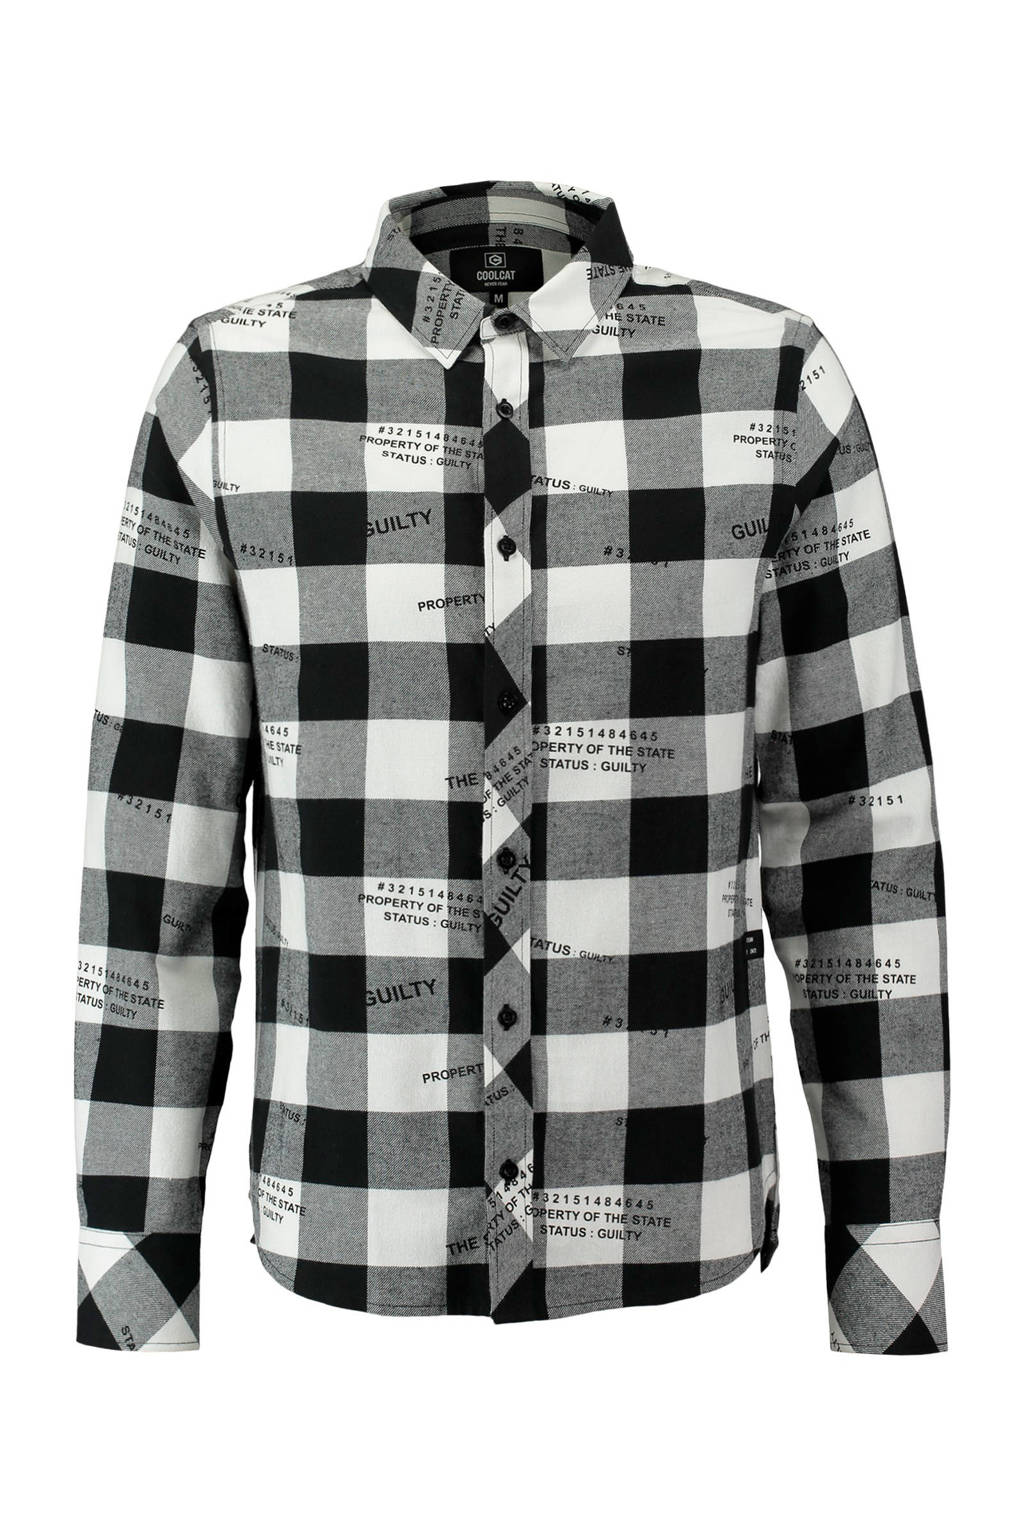 Zwart Wit Geruit Overhemd.Coolcat Geruite Regular Fit Overhemd Zwart Wit Wehkamp